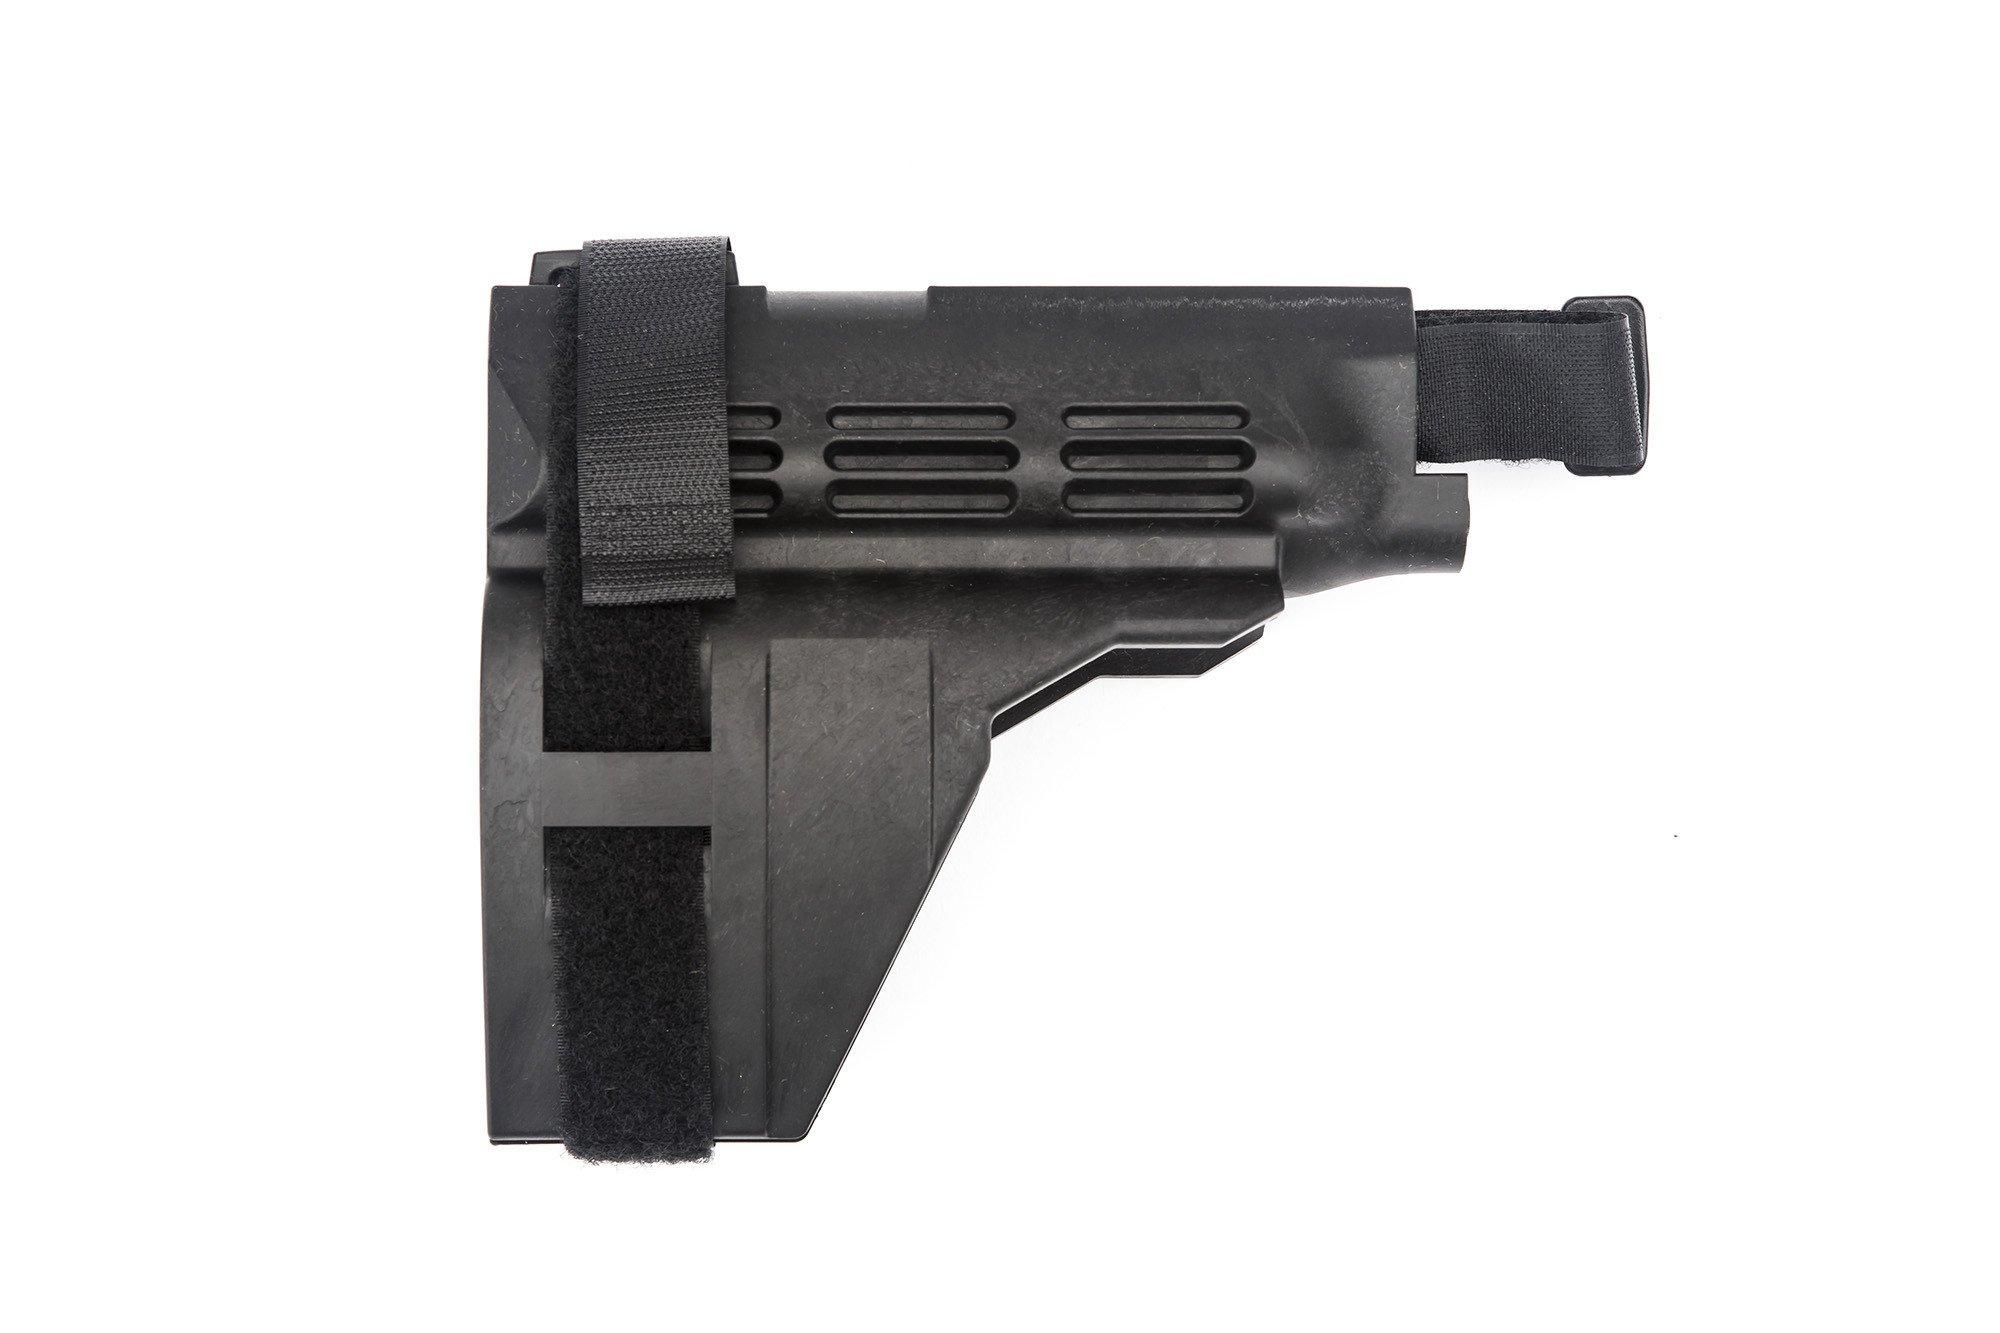 SB 15 Pistol Stabilizing Brace